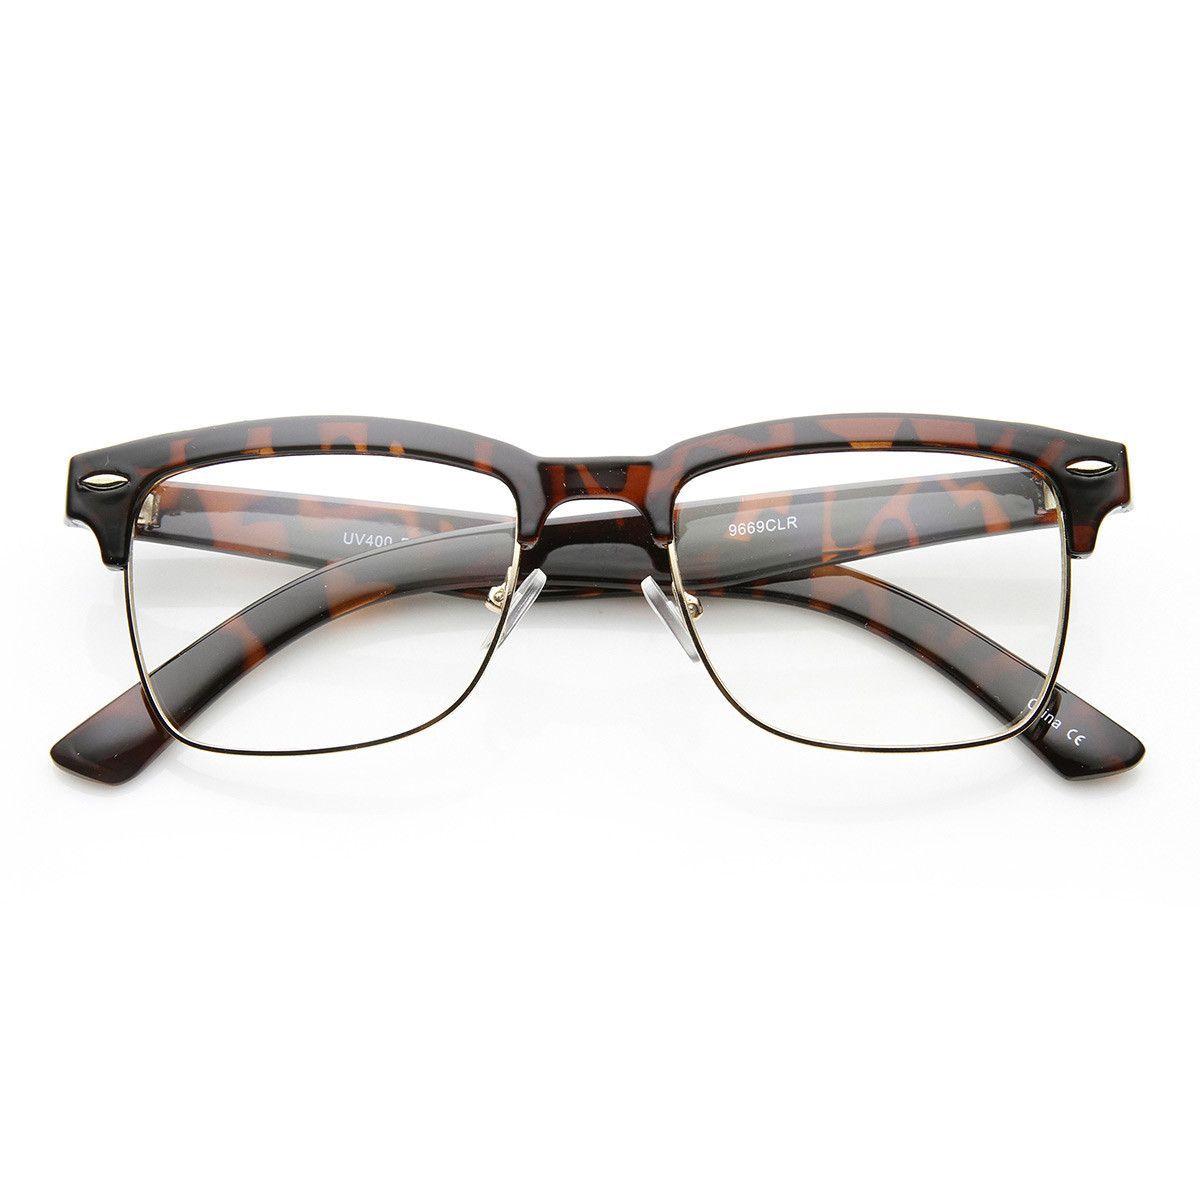 603d689f59d Unisex Square Medium Semi-Rimless Modern Fashion Glasses in 2019 ...